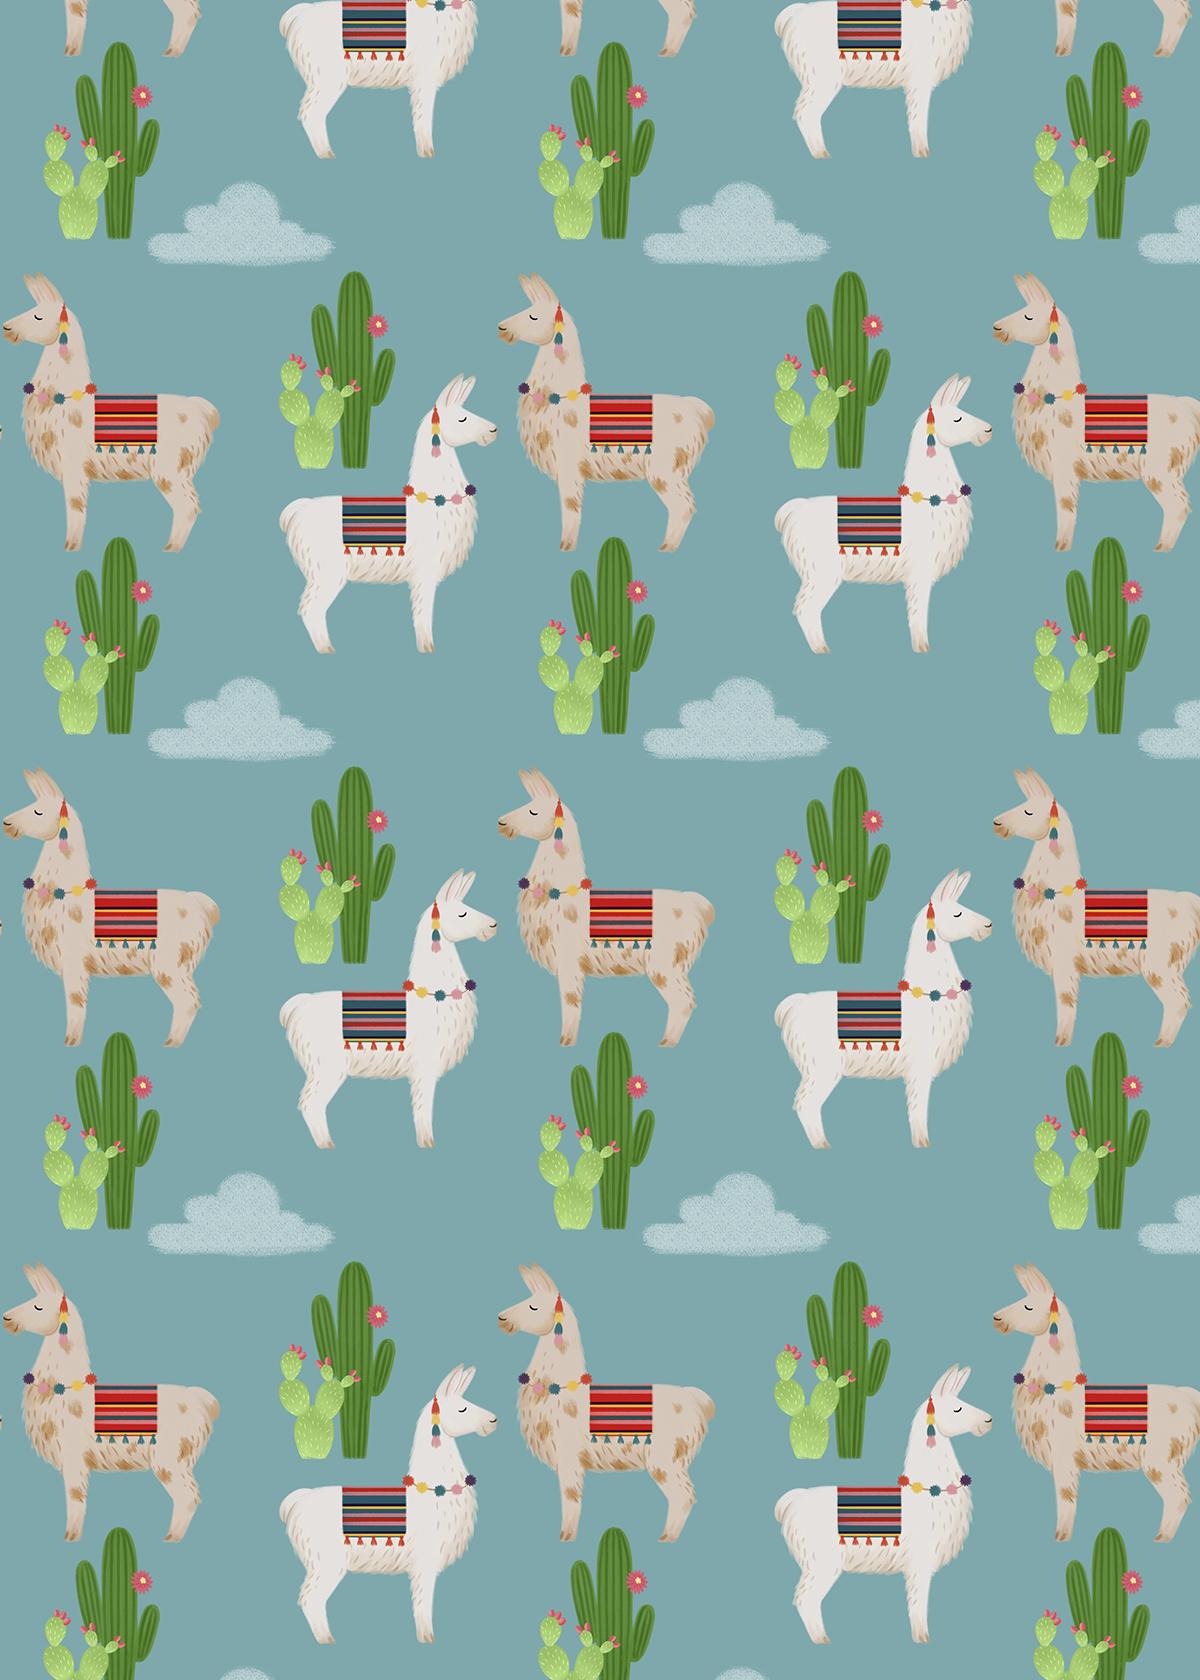 llama alpaca pattern surface cactus cacti cute animal ILLUSTRATION  clouds